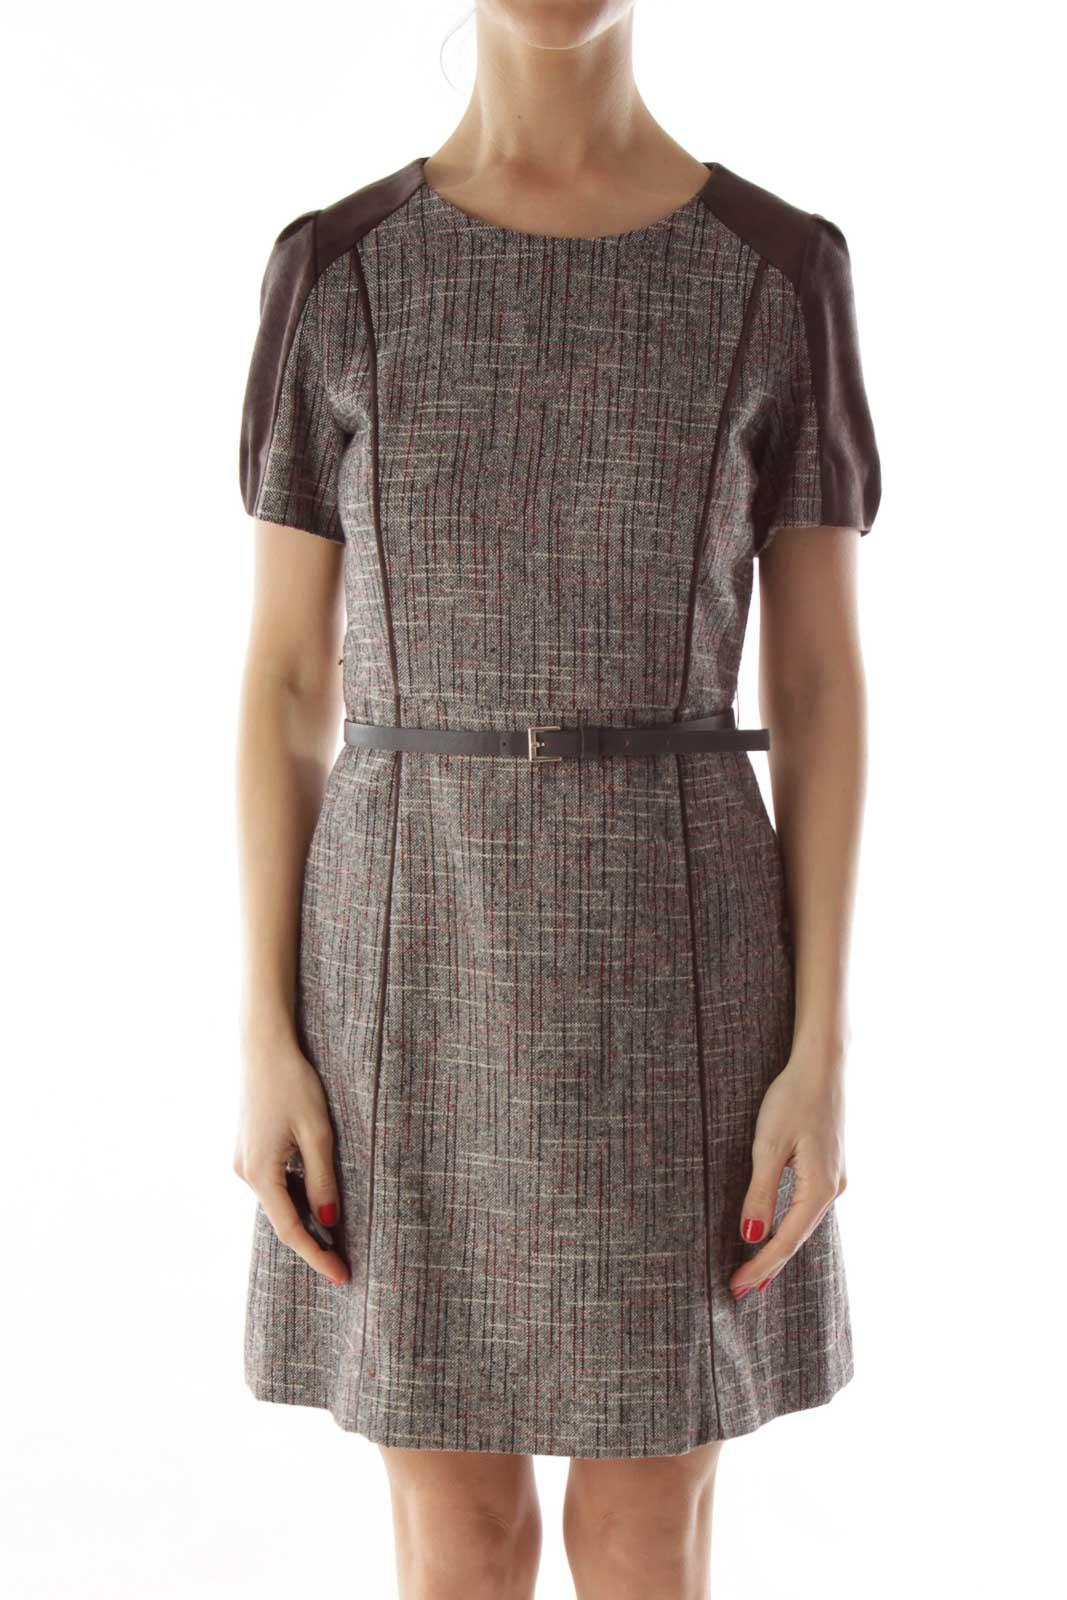 Brown Tweed Swede Belted Work Dress Front